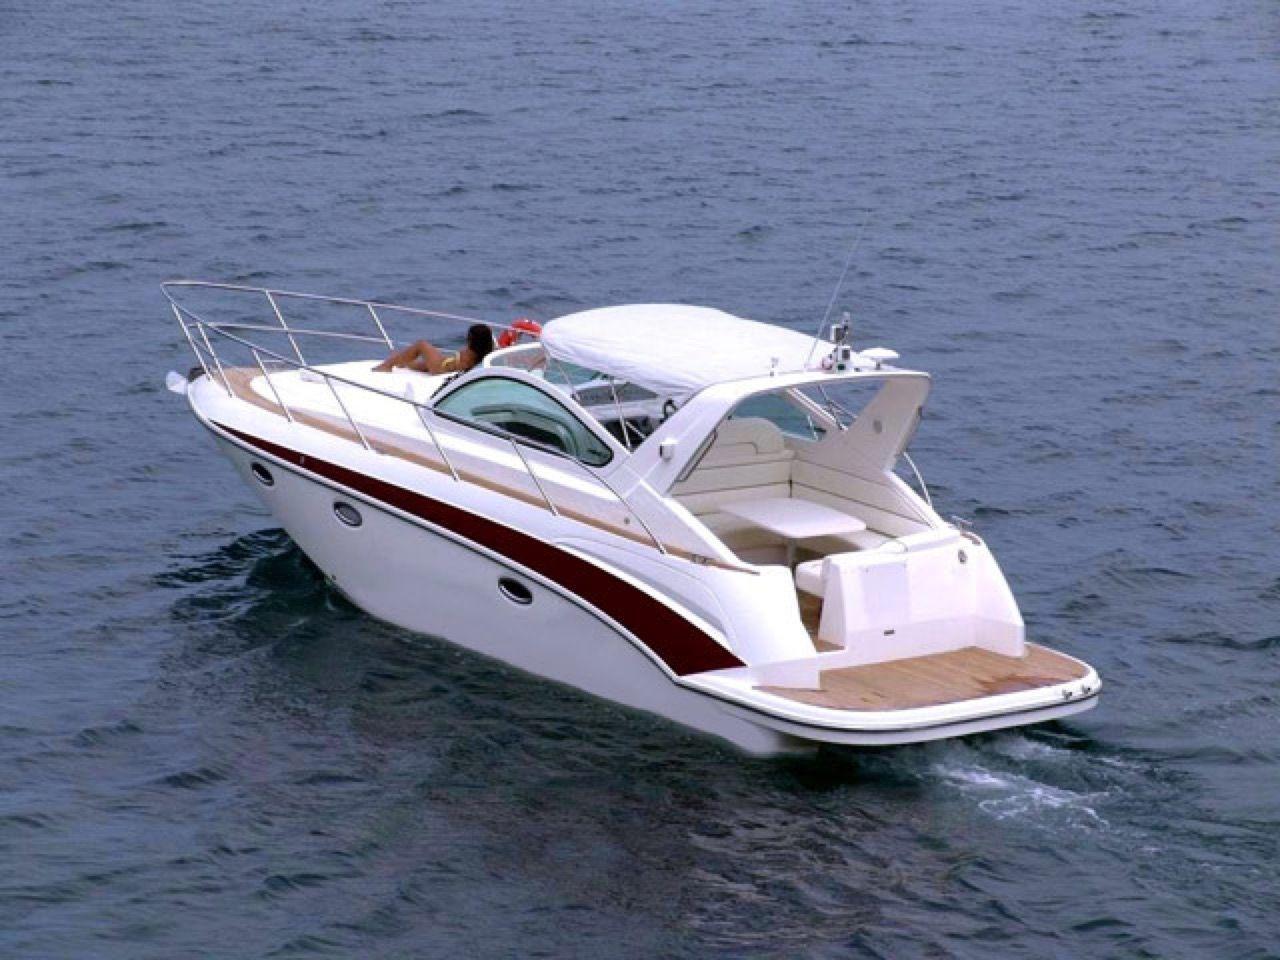 Noleggia yacht - Turchia